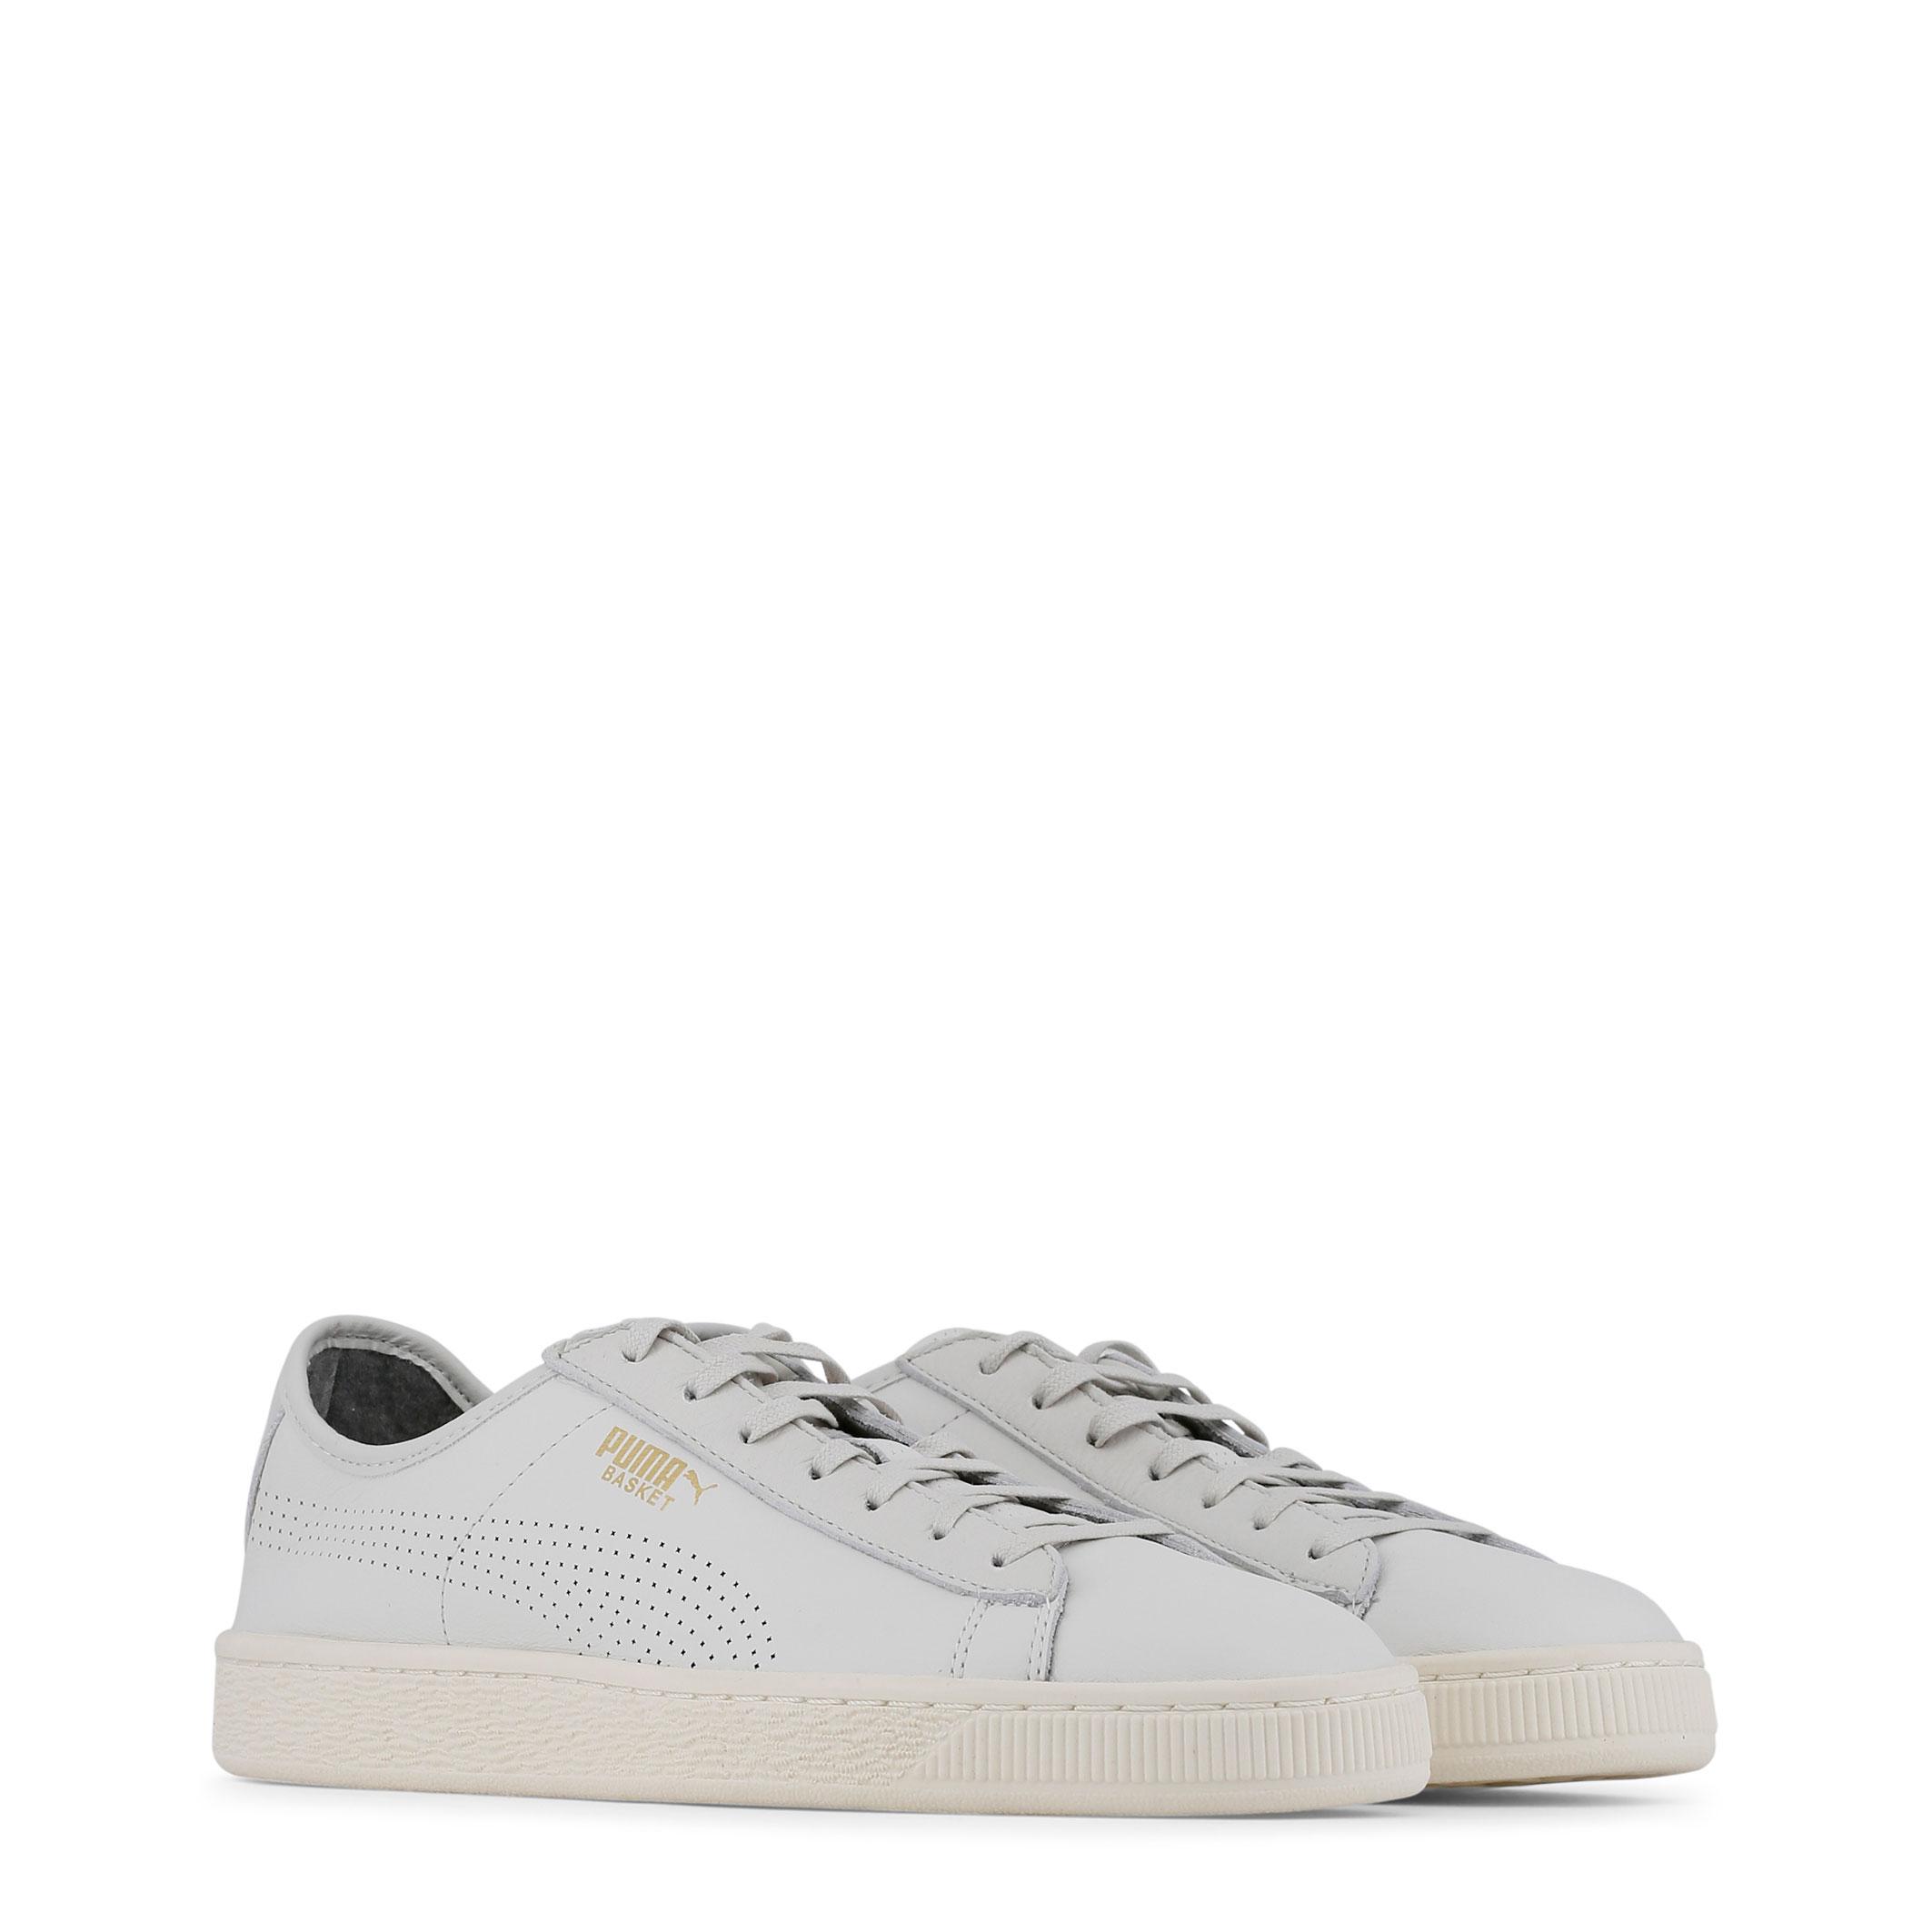 Baskets / Sport  Puma 363824 white